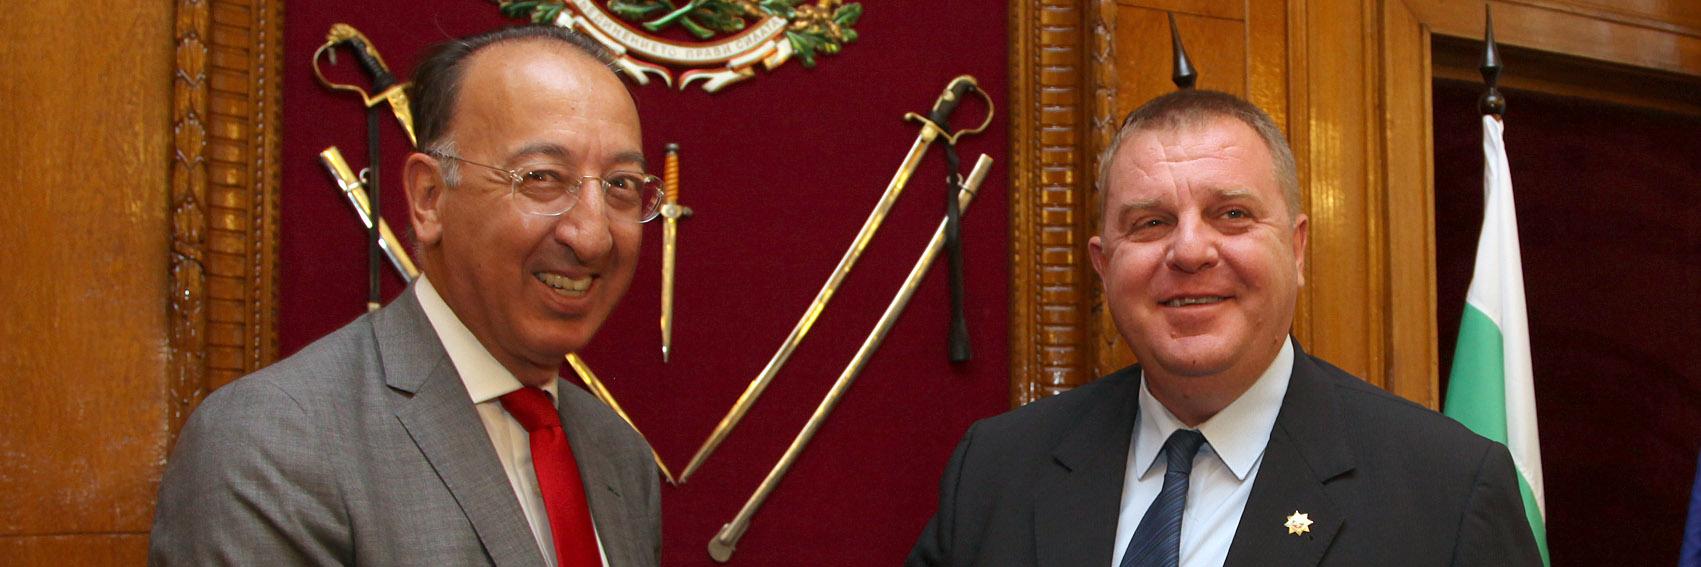 Chief Executive Domecq visits Bulgaria